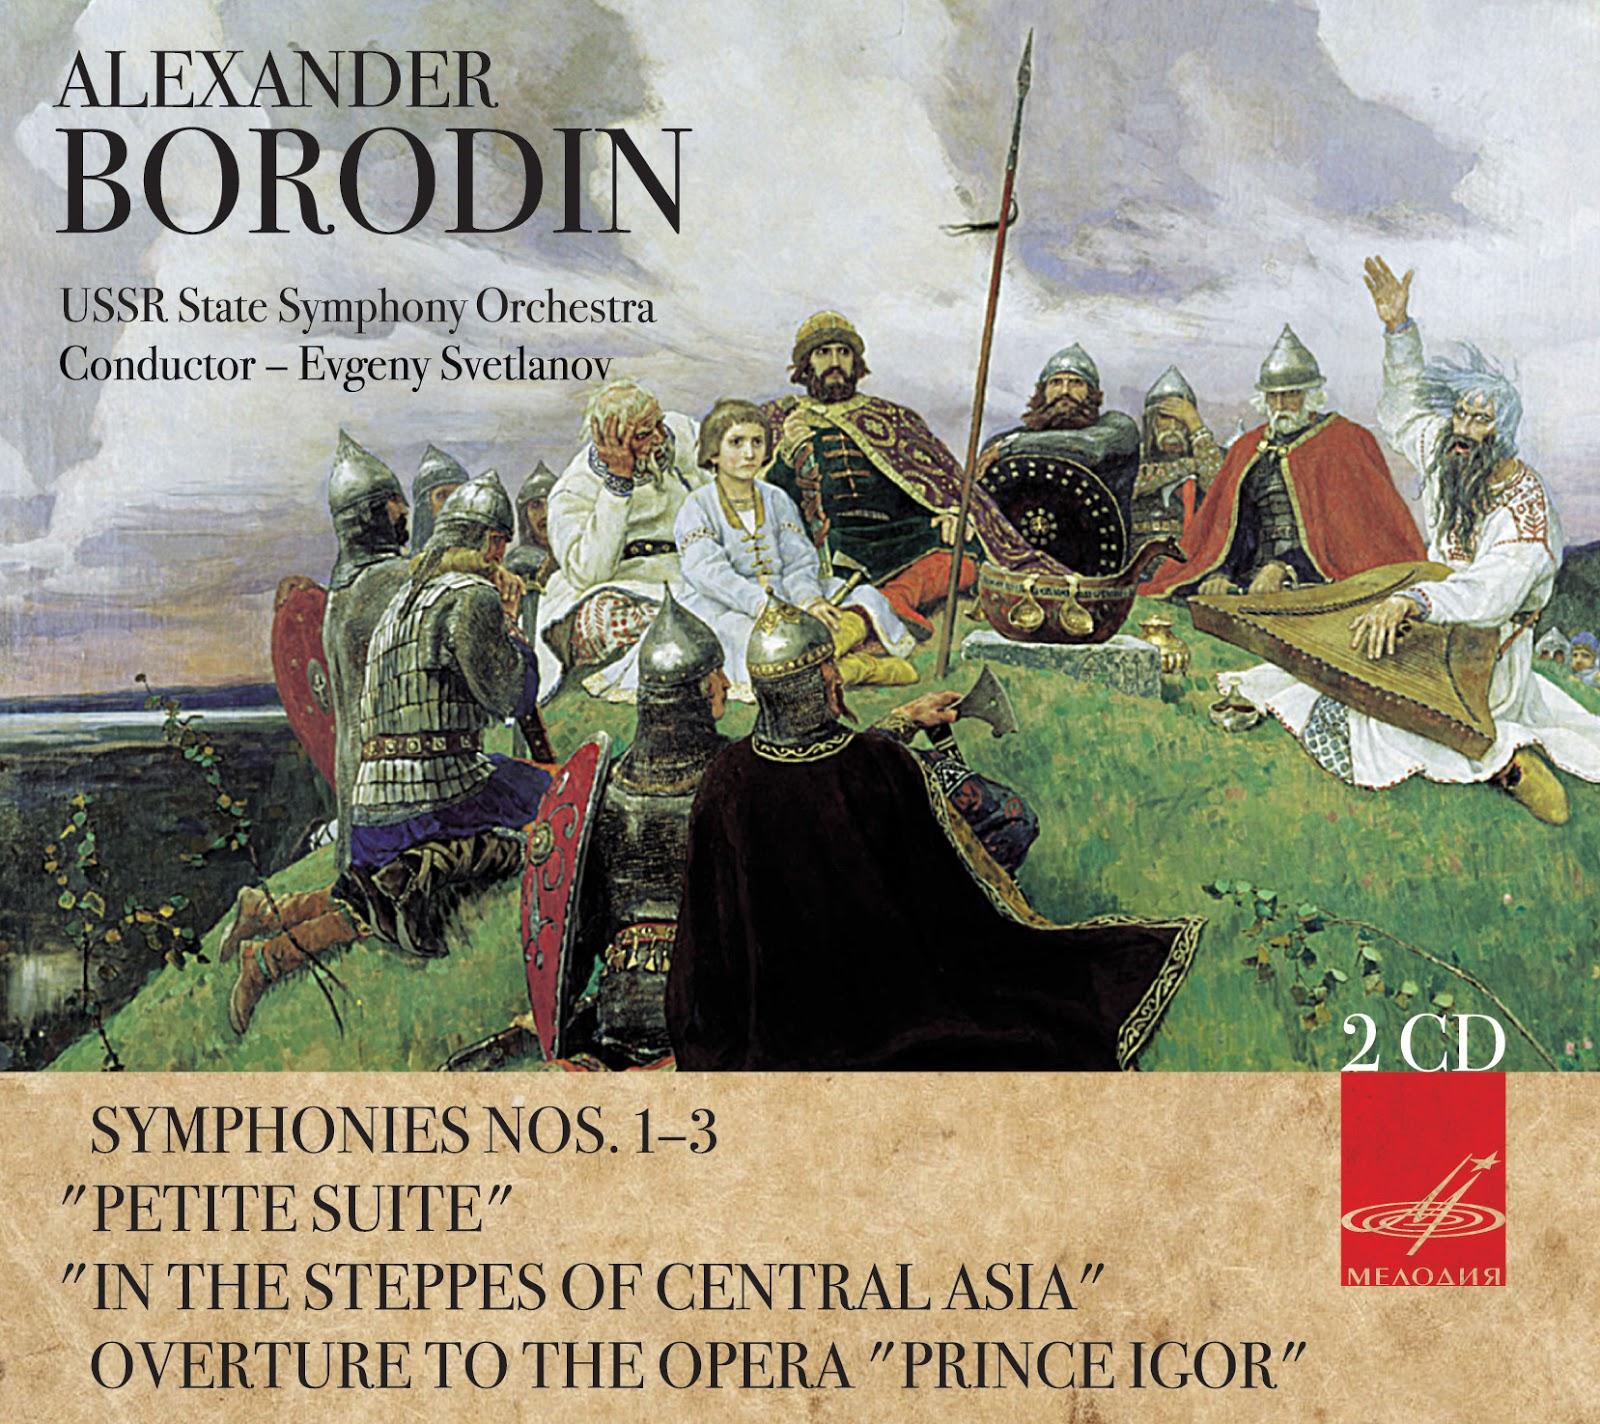 Alexander Borodin* Borodin·/ Modest Mussorgsky* Mussorgsky·/ Piotr Illitch Tchaïkovsky* Tchaikovsky - Polovtsian Dances / Night On The Bare Mountain / Italian Caprice